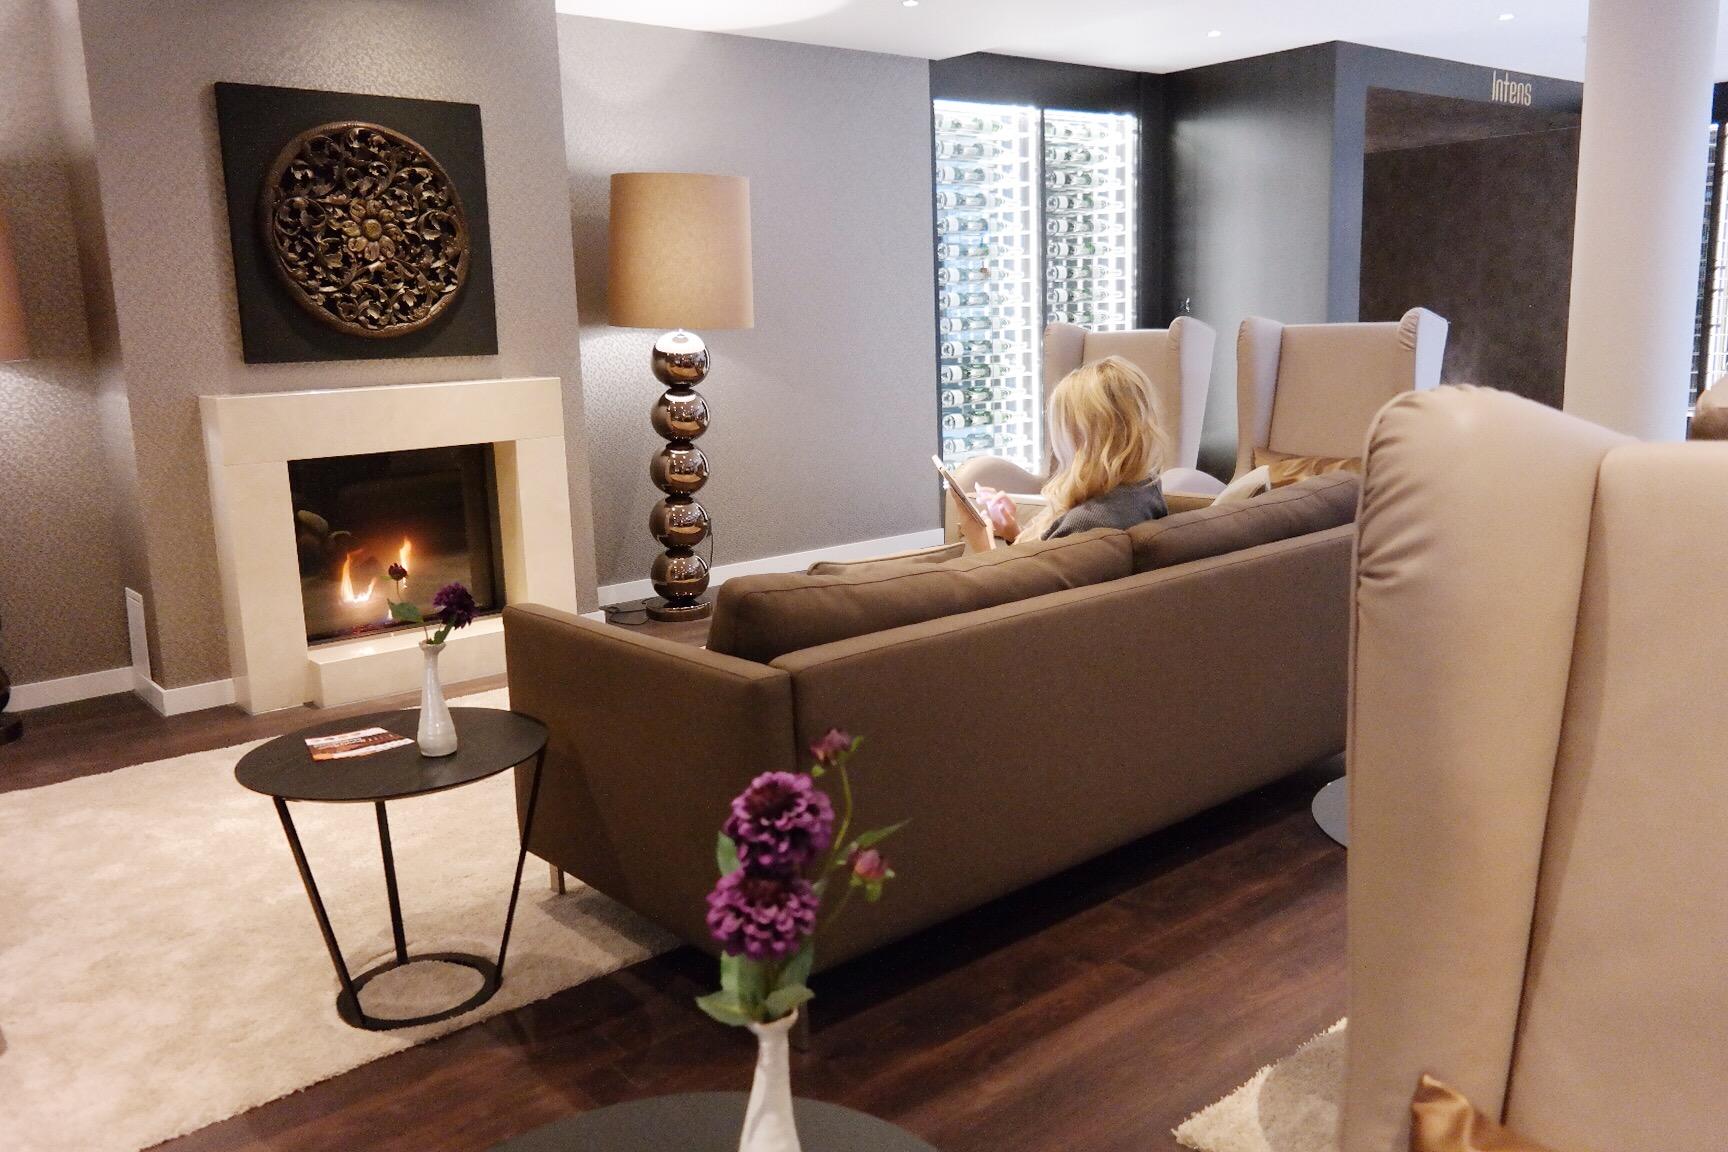 missbbontour wellness date in den thermen bussloo missbonn e bonn e. Black Bedroom Furniture Sets. Home Design Ideas